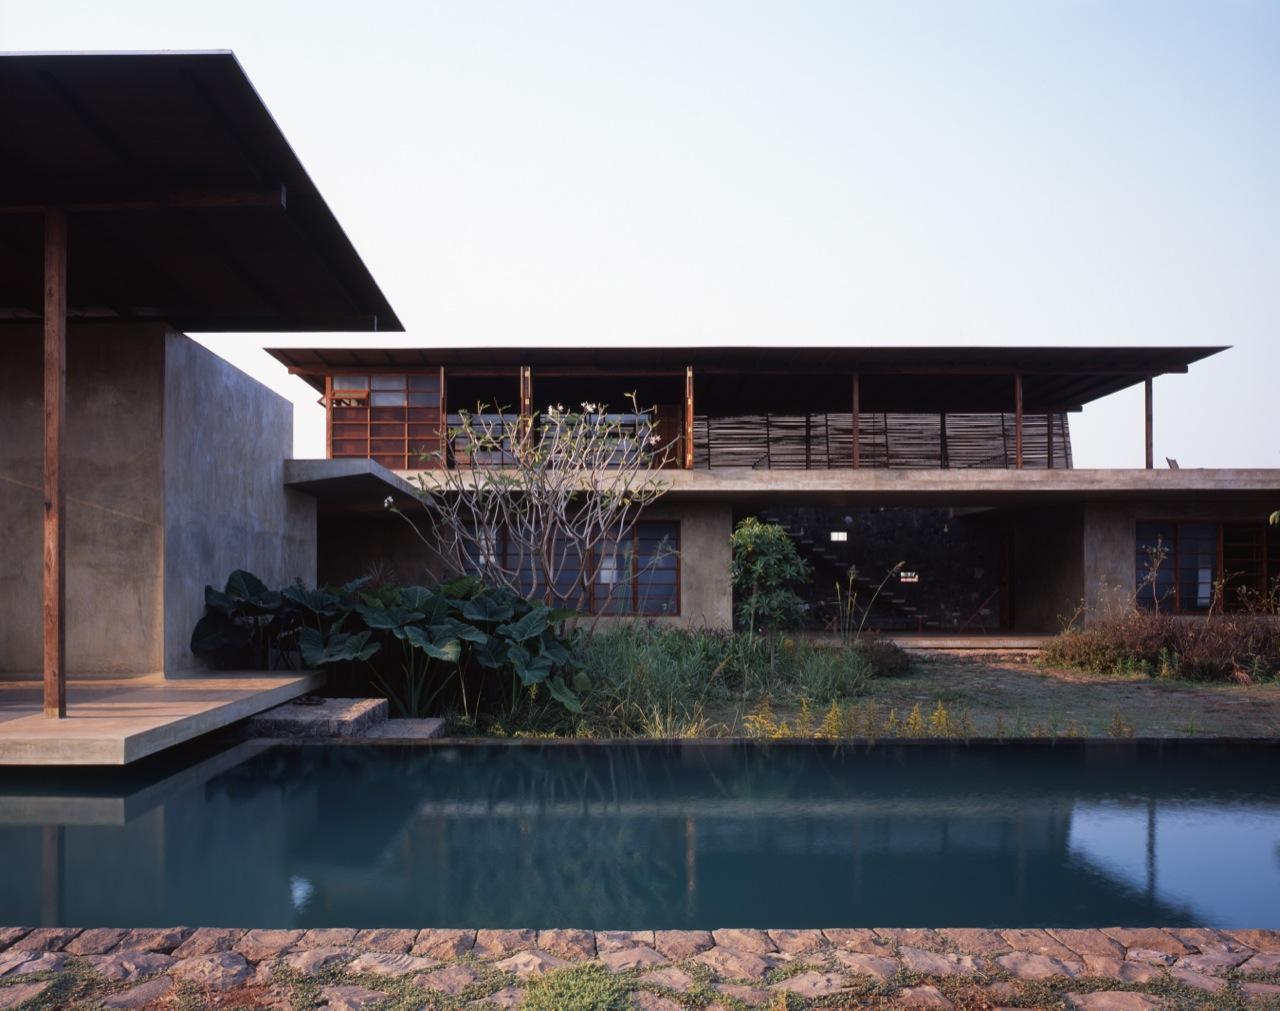 Casa Utsav / Studio Mumbai Architects, Cortesia de Studio Mumbai